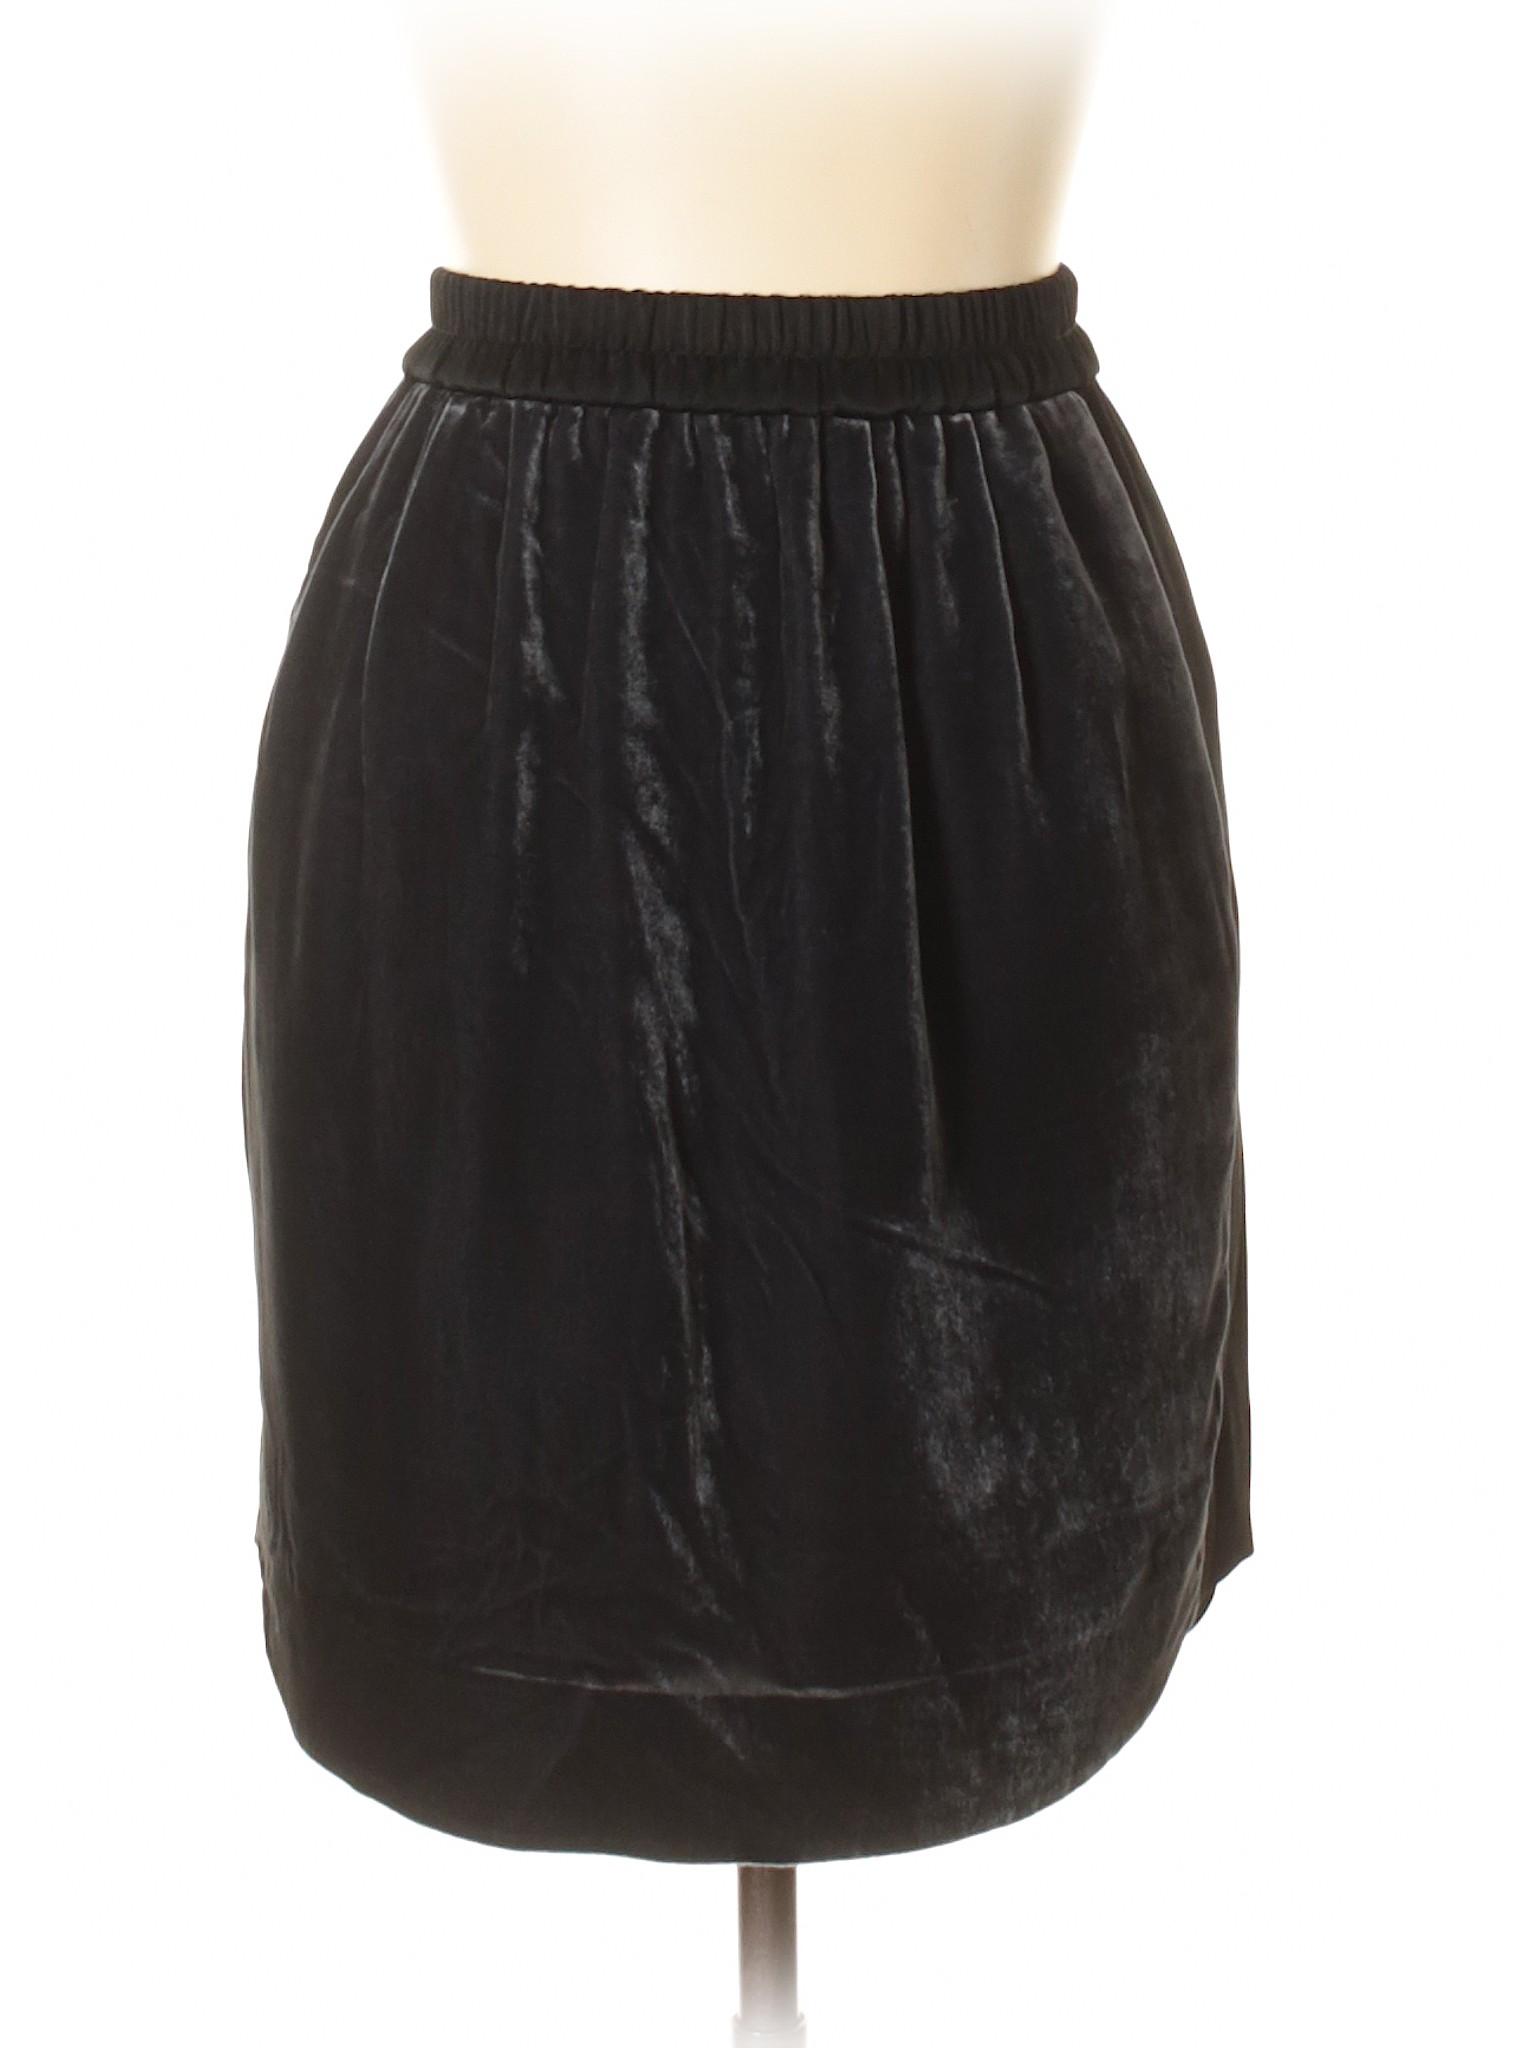 Skirt Boutique Boutique Skirt Casual Casual Tz6Bqq